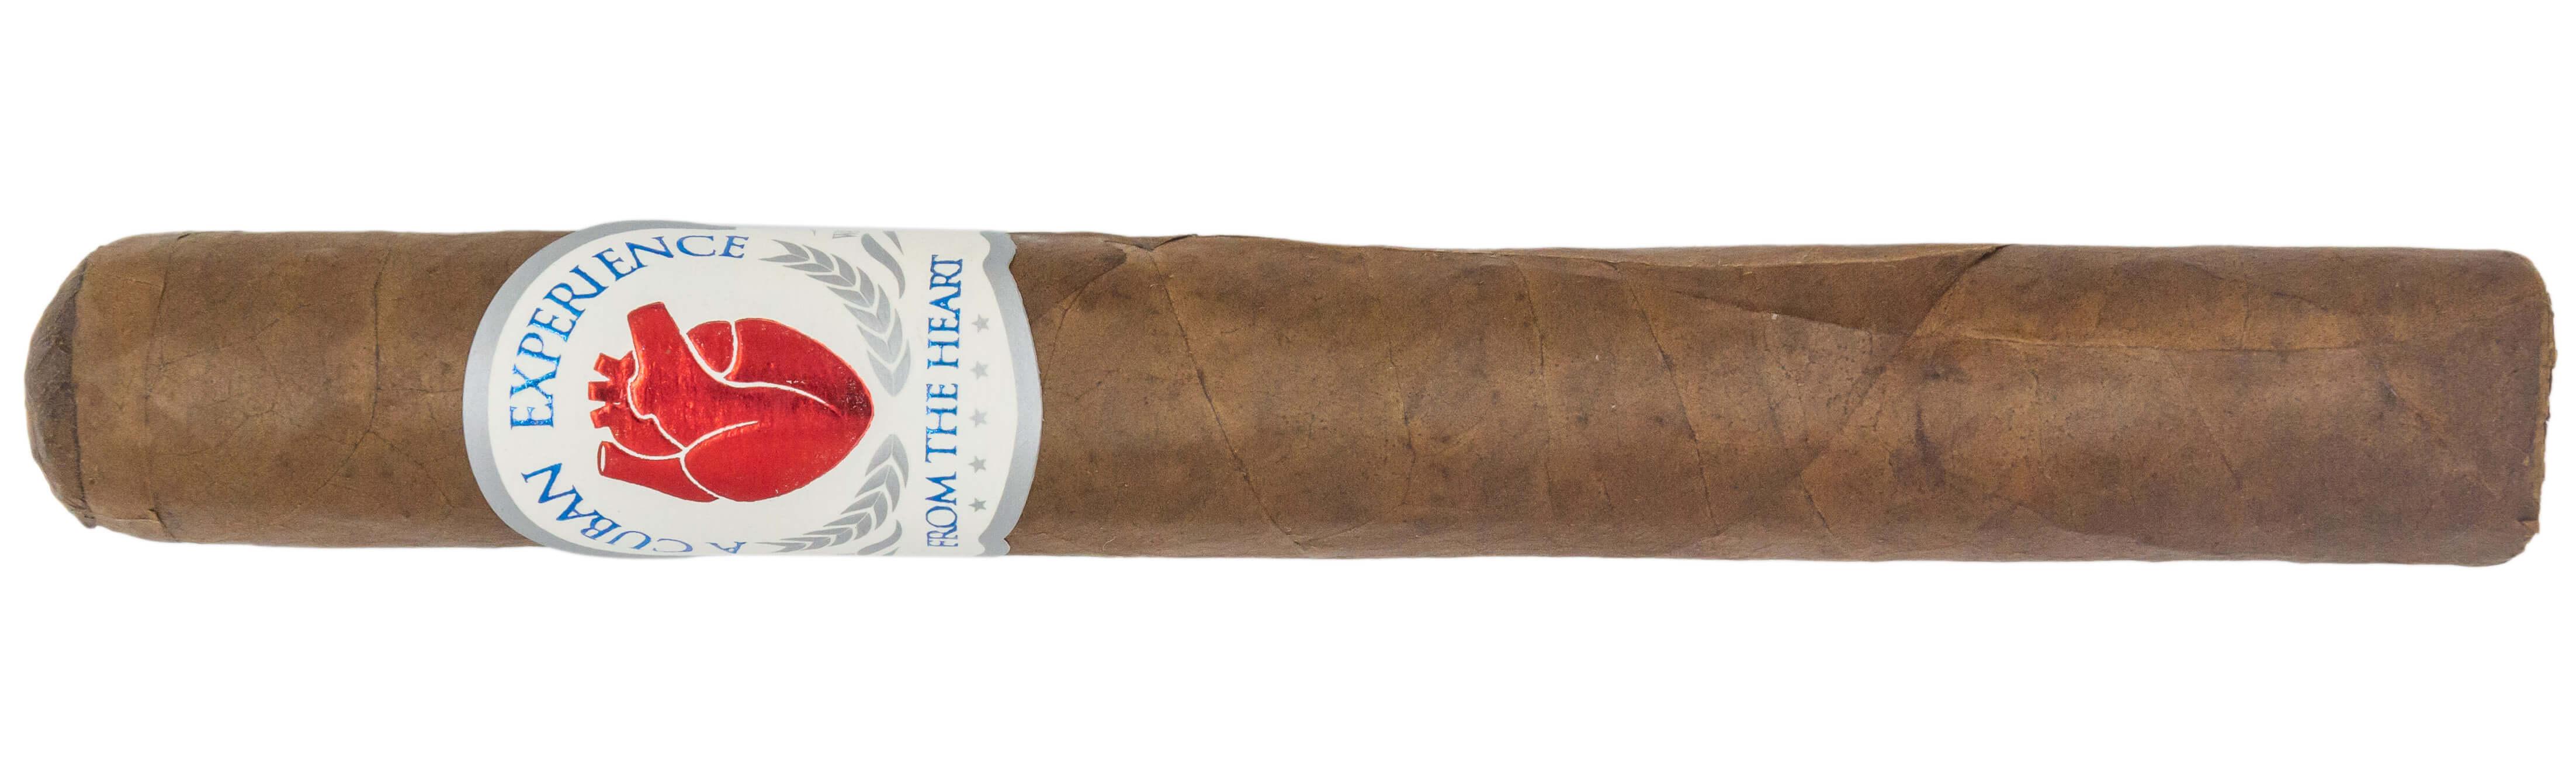 Blind Cigar Review: A.C.E Prime | A Cuban Experience El Corazon